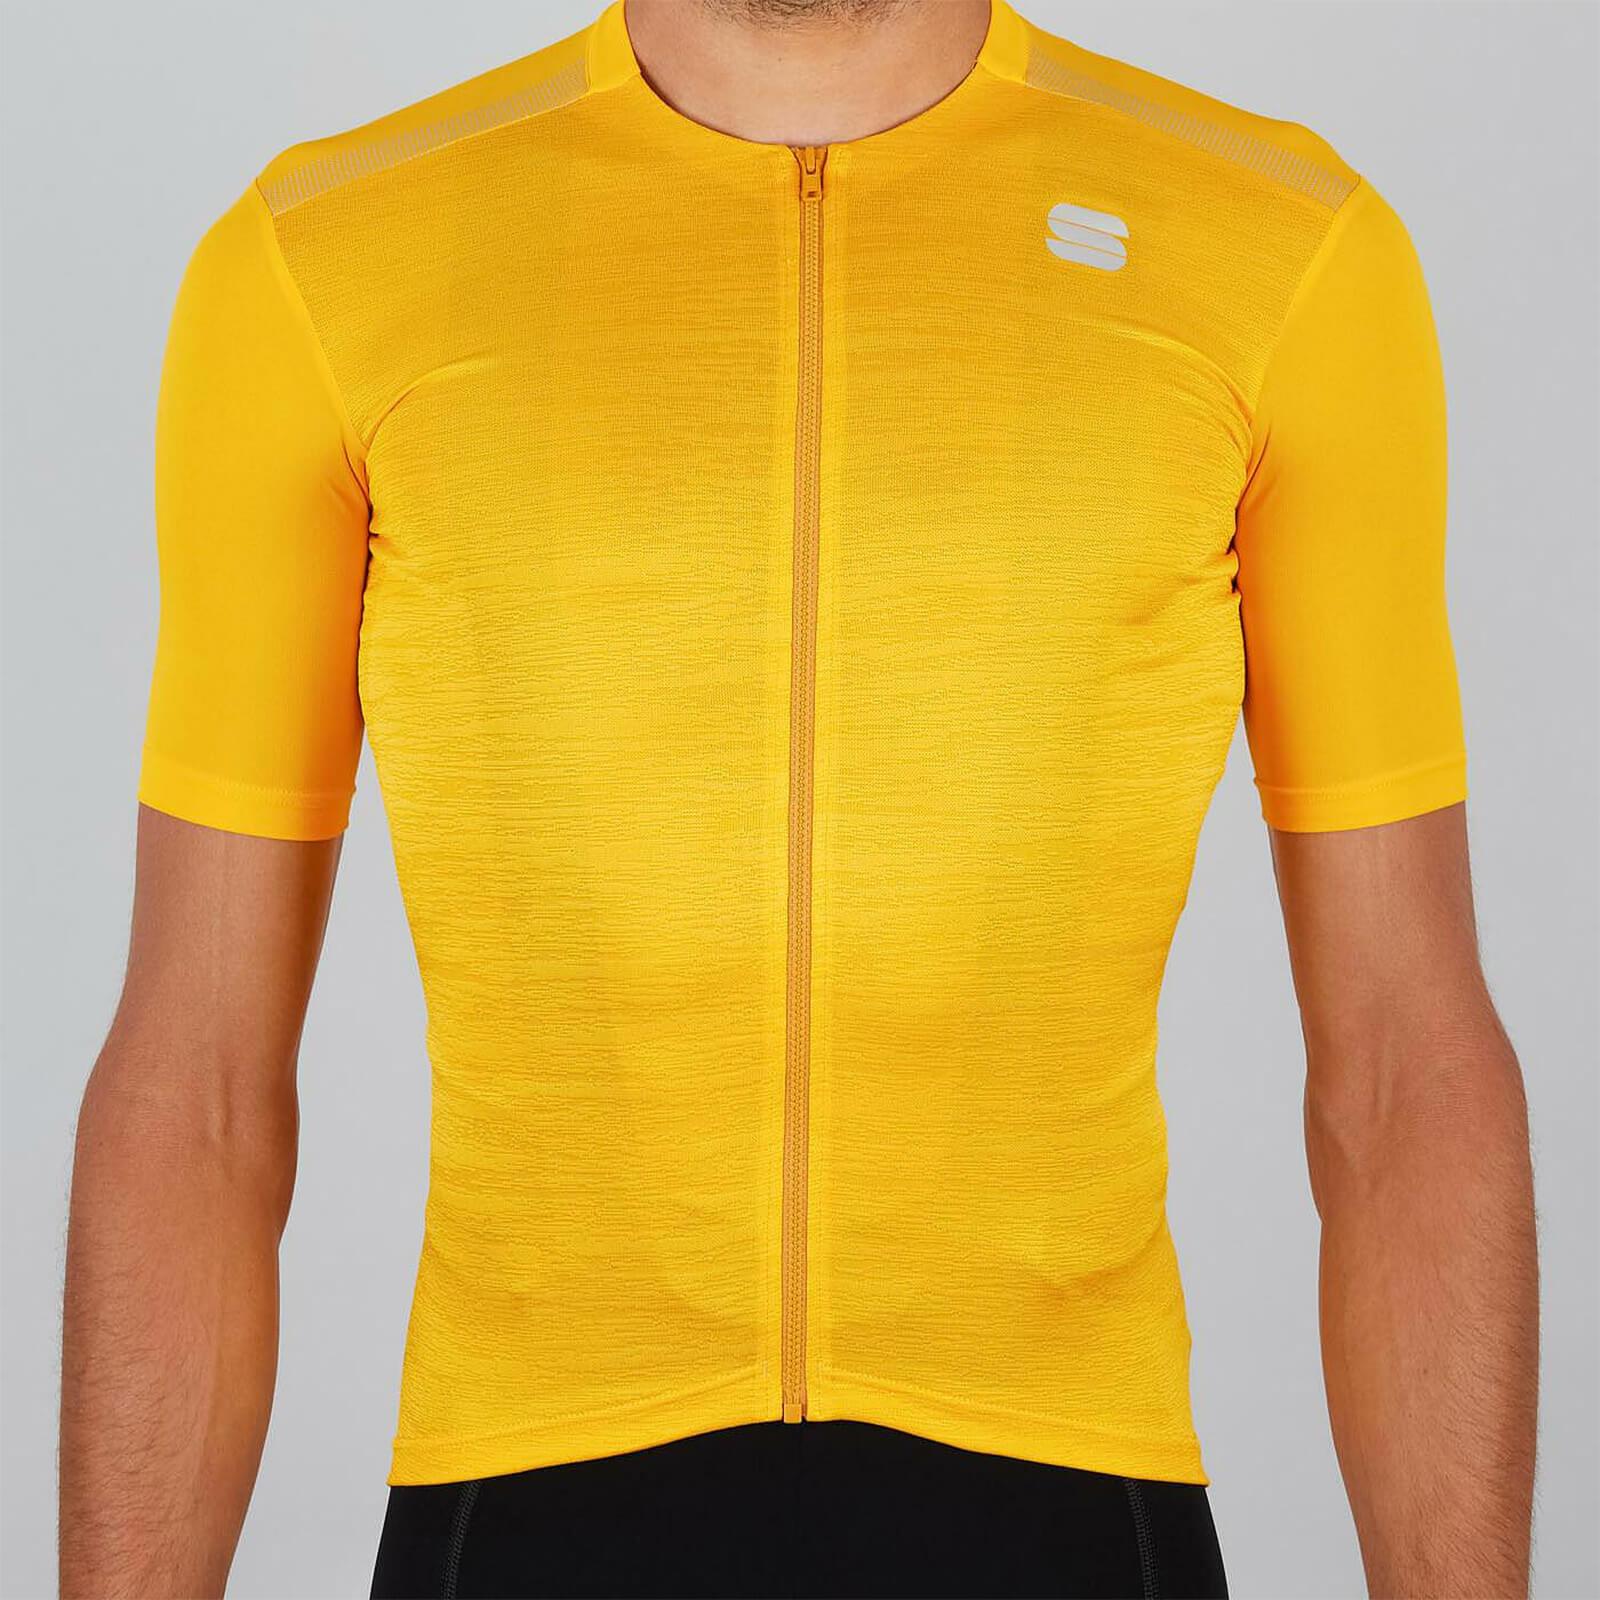 Sportful Supergiara Jersey - L - Yellow